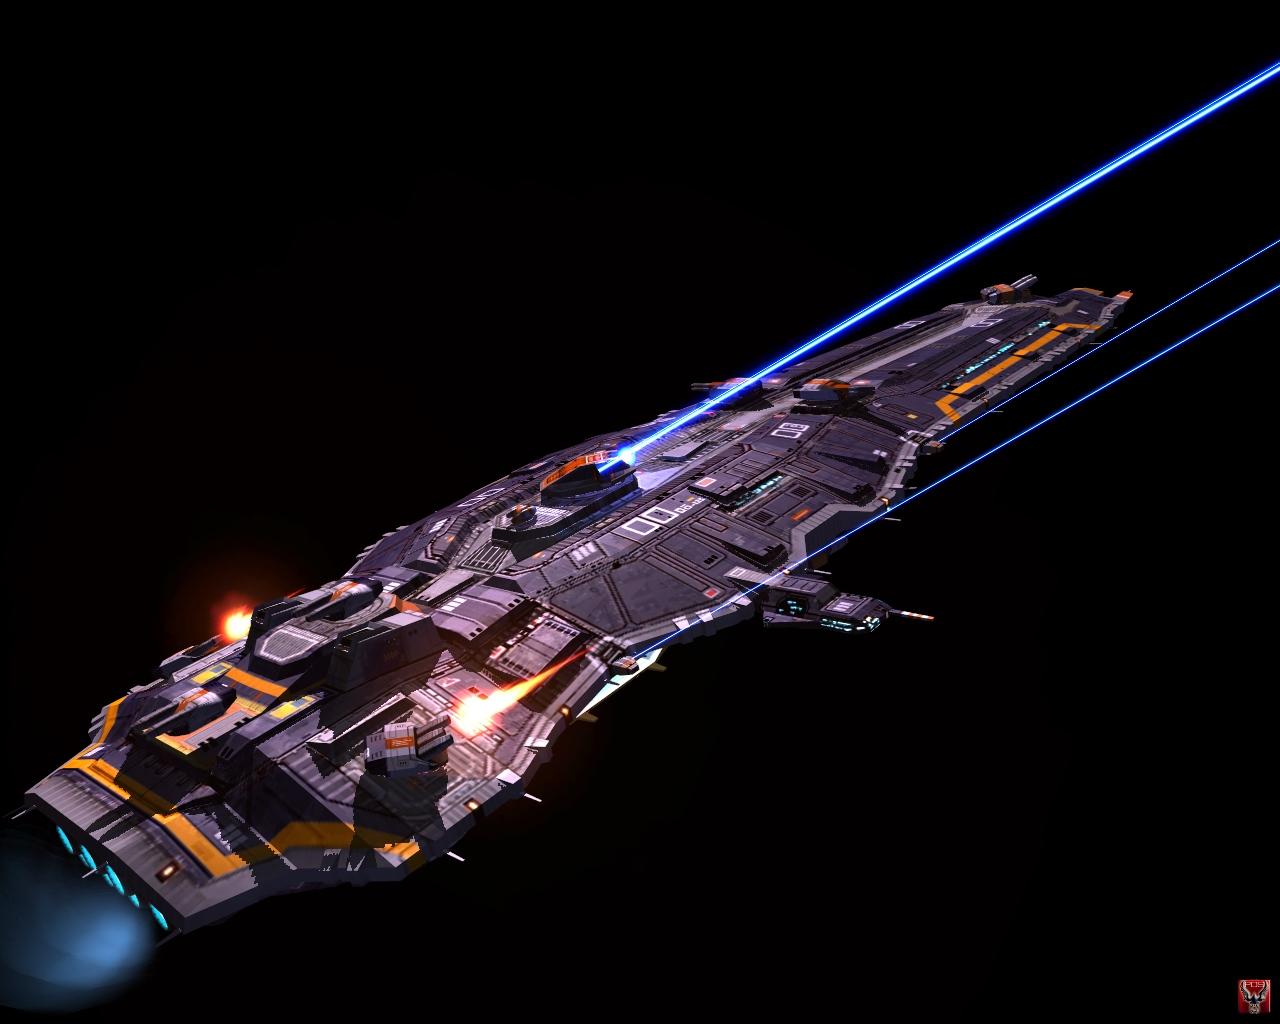 [48+] Sci Fi Ships Wallpaper On WallpaperSafari